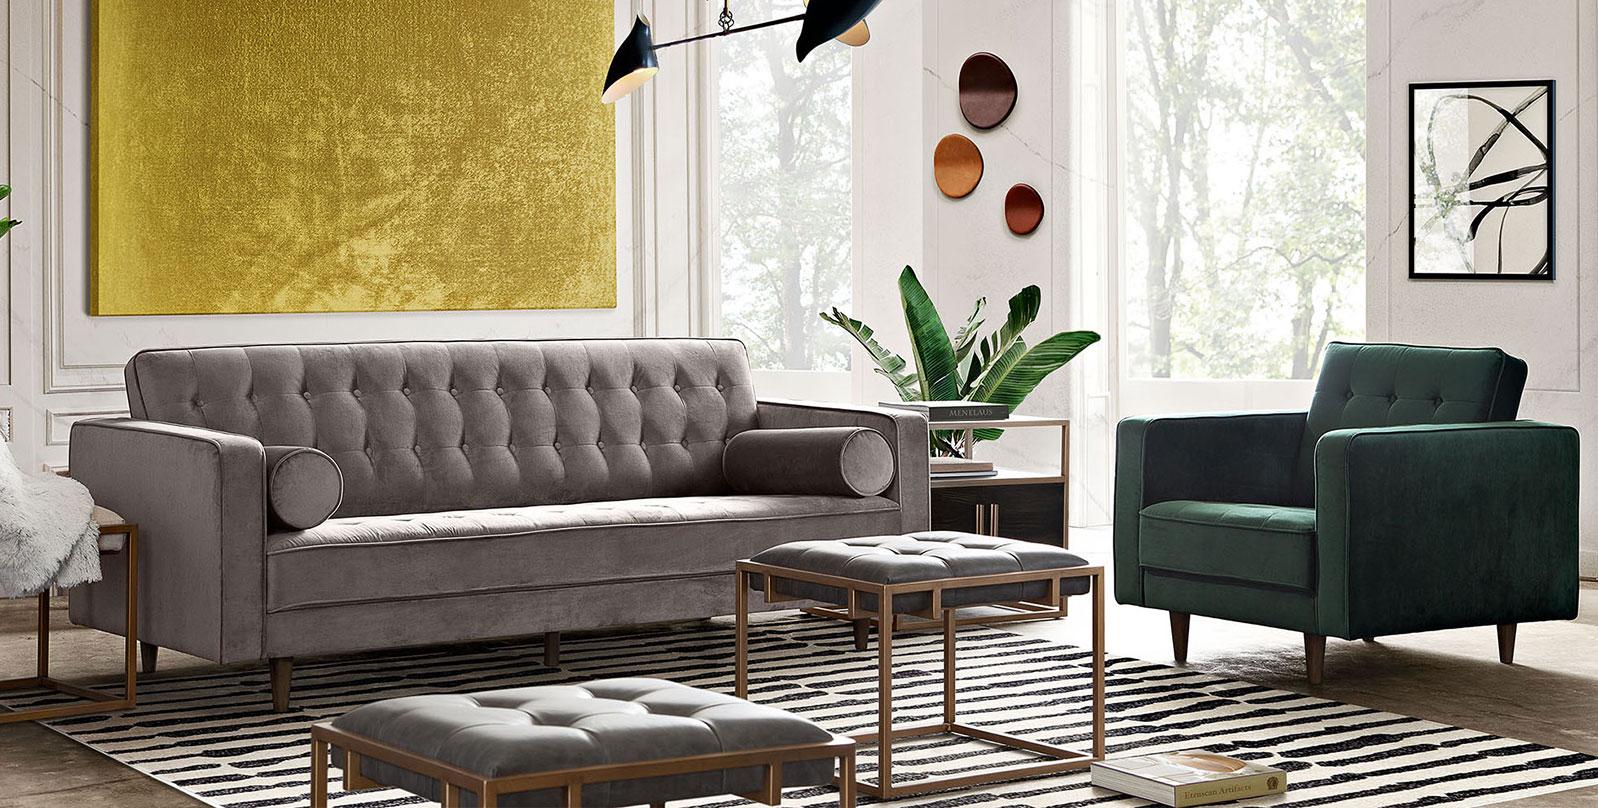 beautifully accessorized livingroom